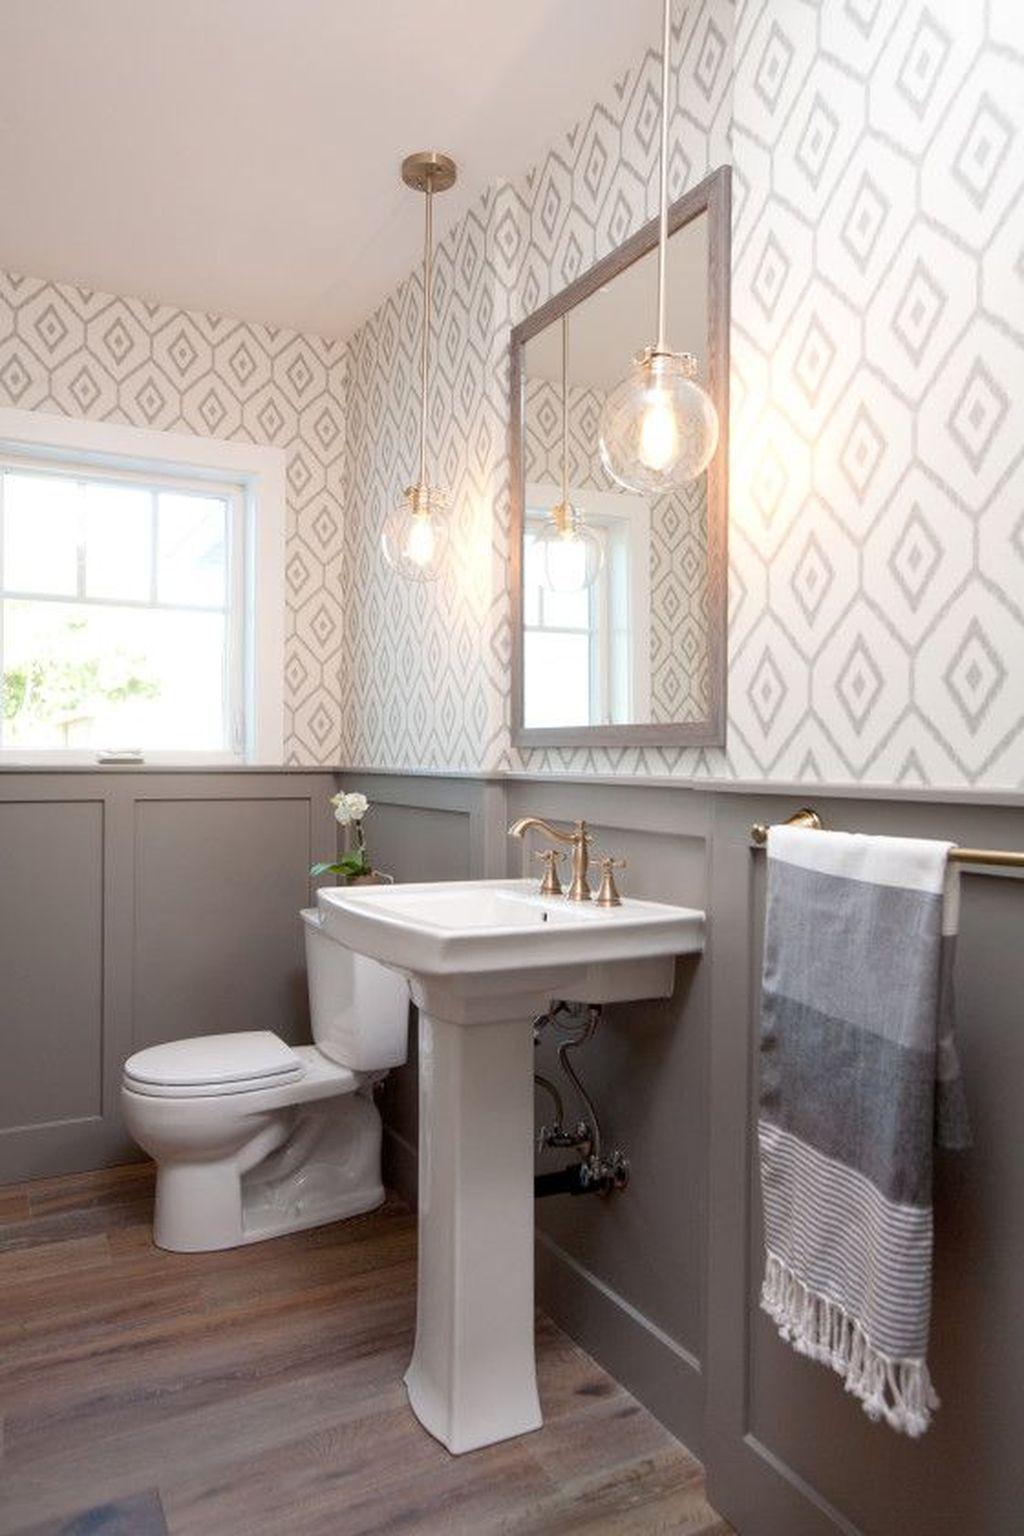 Farmhouse Small Bathroom Remodel And Decor Ideas (12) #bathroomremodeling